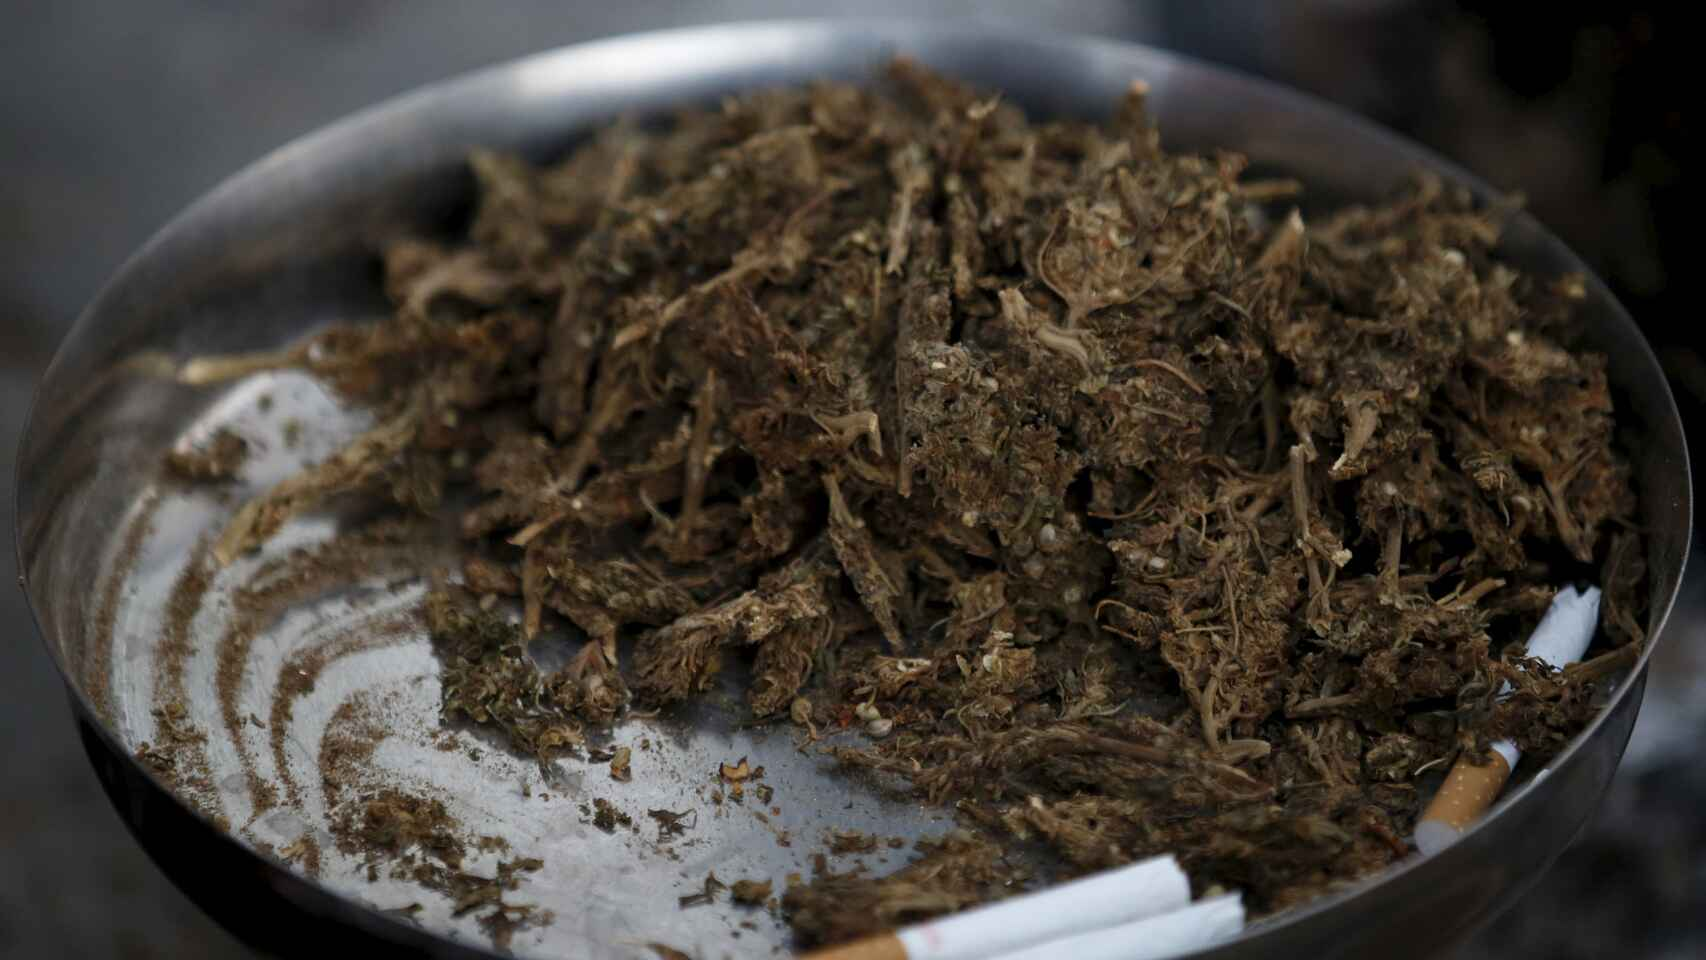 Un plato de marihuana en el festival Shivaratri de la India.